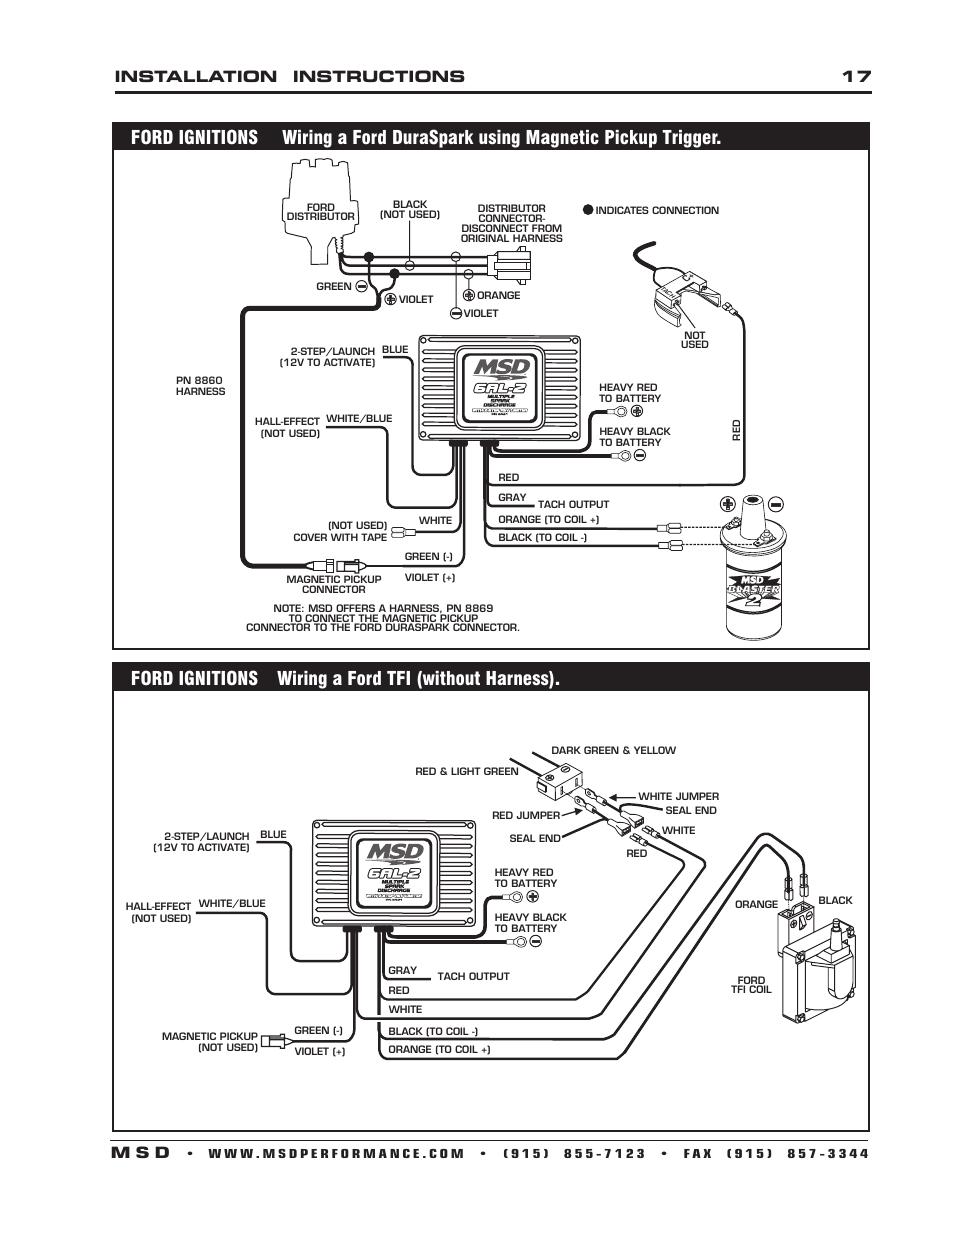 msd 6421 wiring diagram msd 3 step wiring